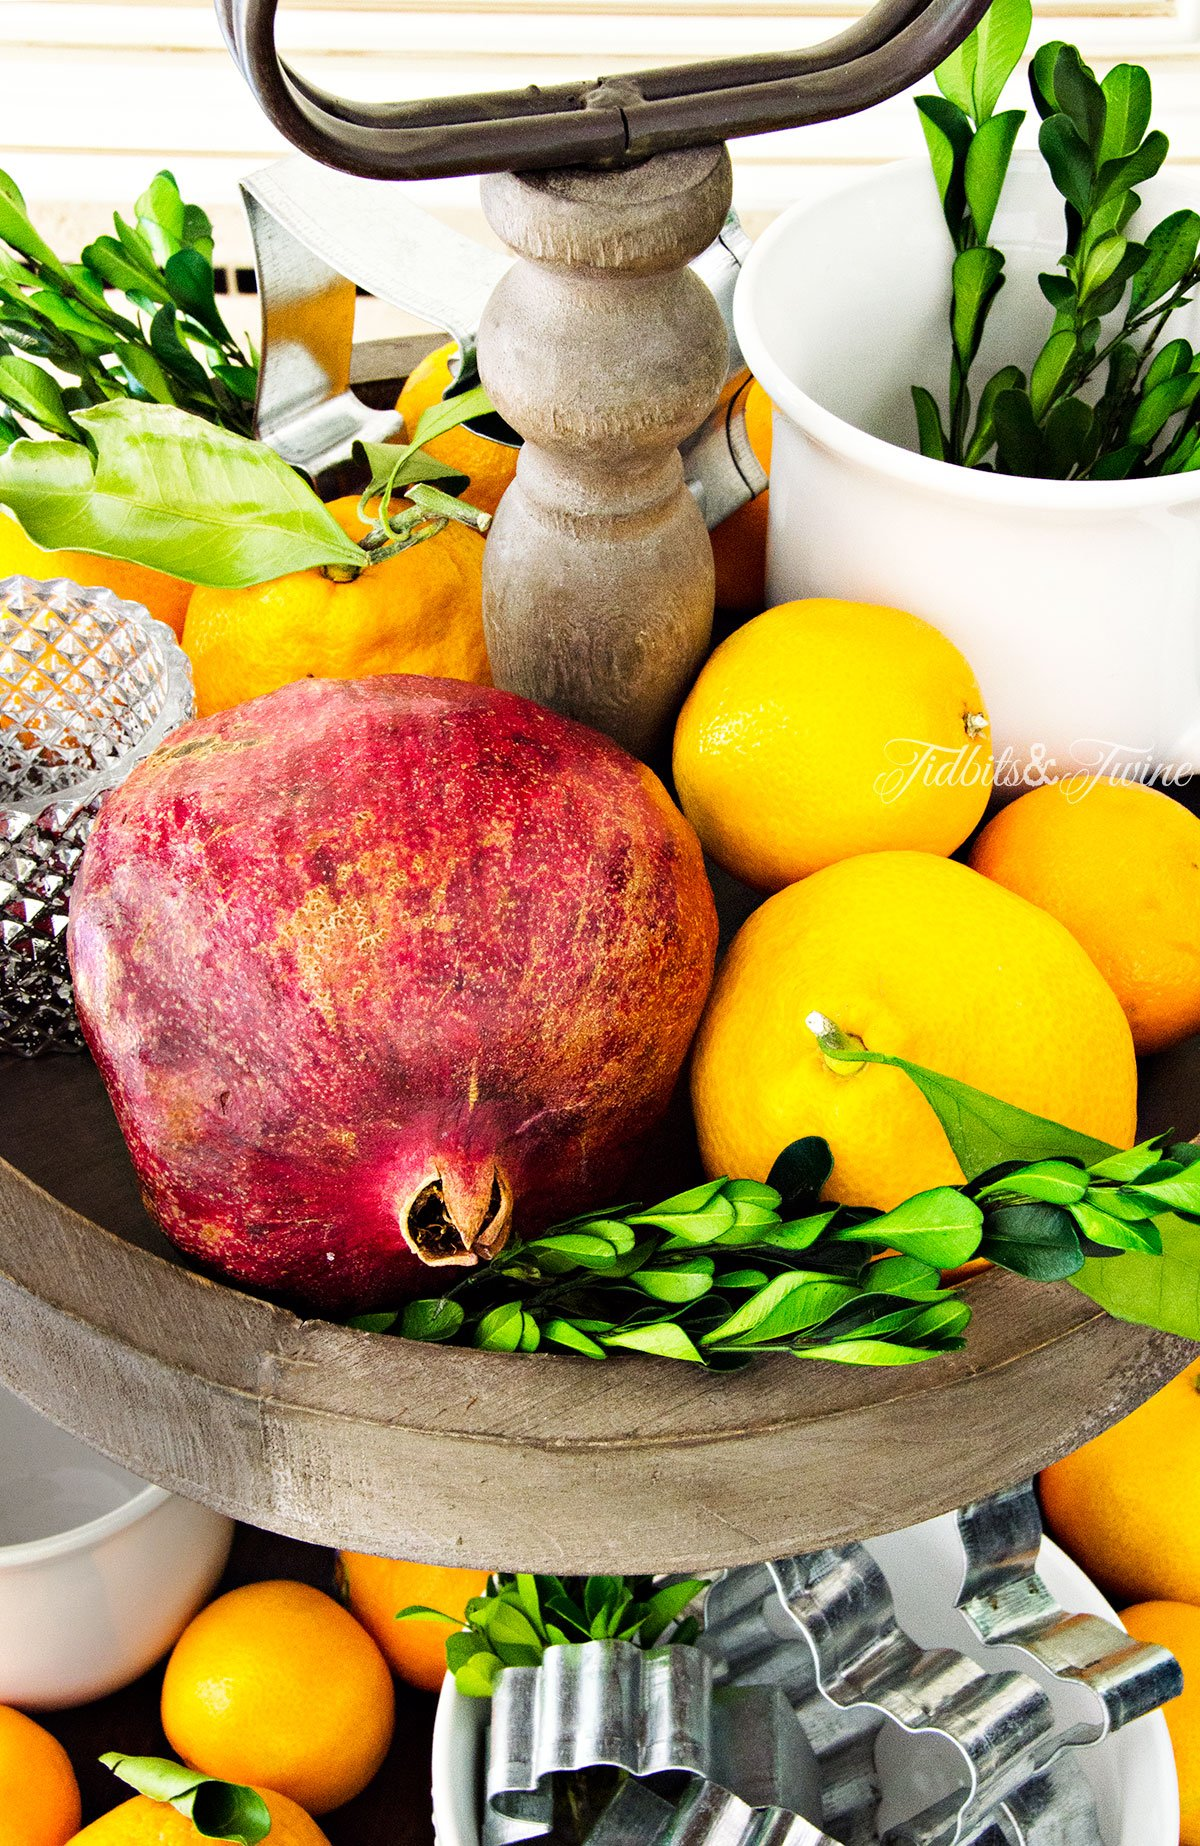 TIDBITS&TWINE - Christmas Kitchen 2015 with Boxwood, Pomegranates and Oranges